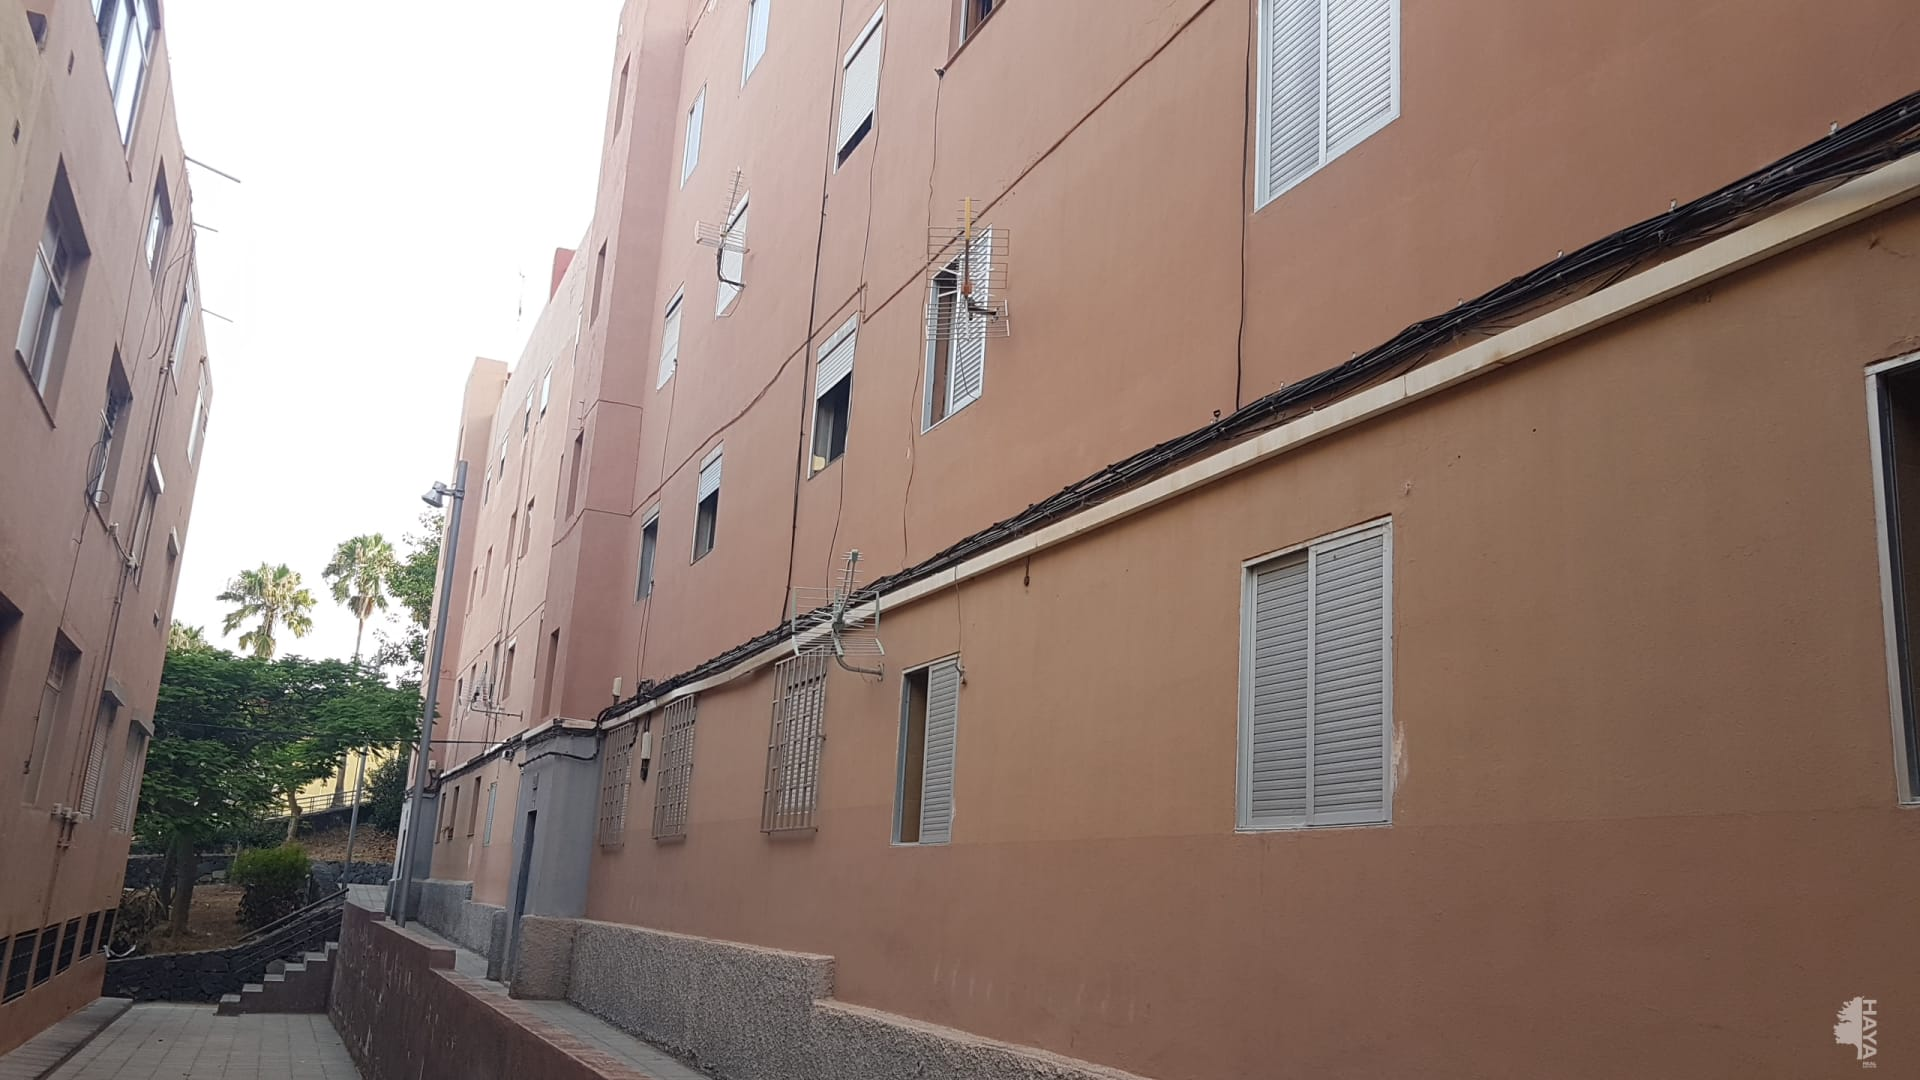 Piso en venta en Santa Cruz de Tenerife, Santa Cruz de Tenerife, Calle Rio Pisuerga, 57.500 €, 3 habitaciones, 1 baño, 82 m2